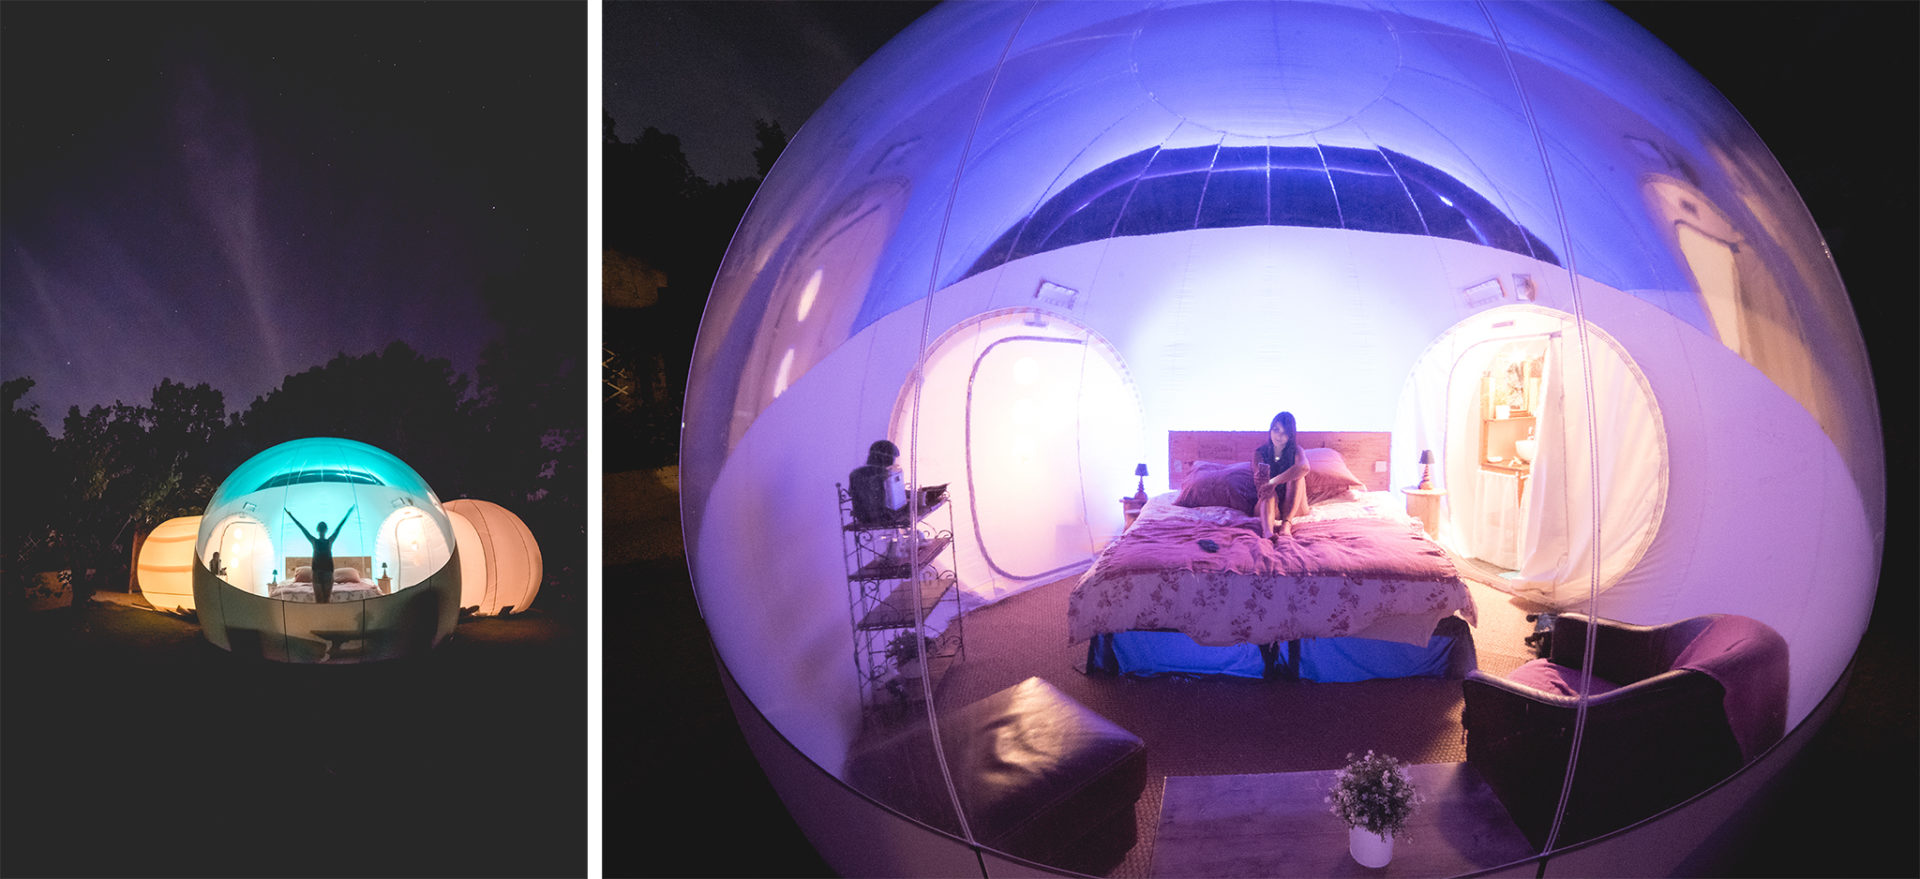 dormir dans une bulle g ante une exp rience in dite. Black Bedroom Furniture Sets. Home Design Ideas